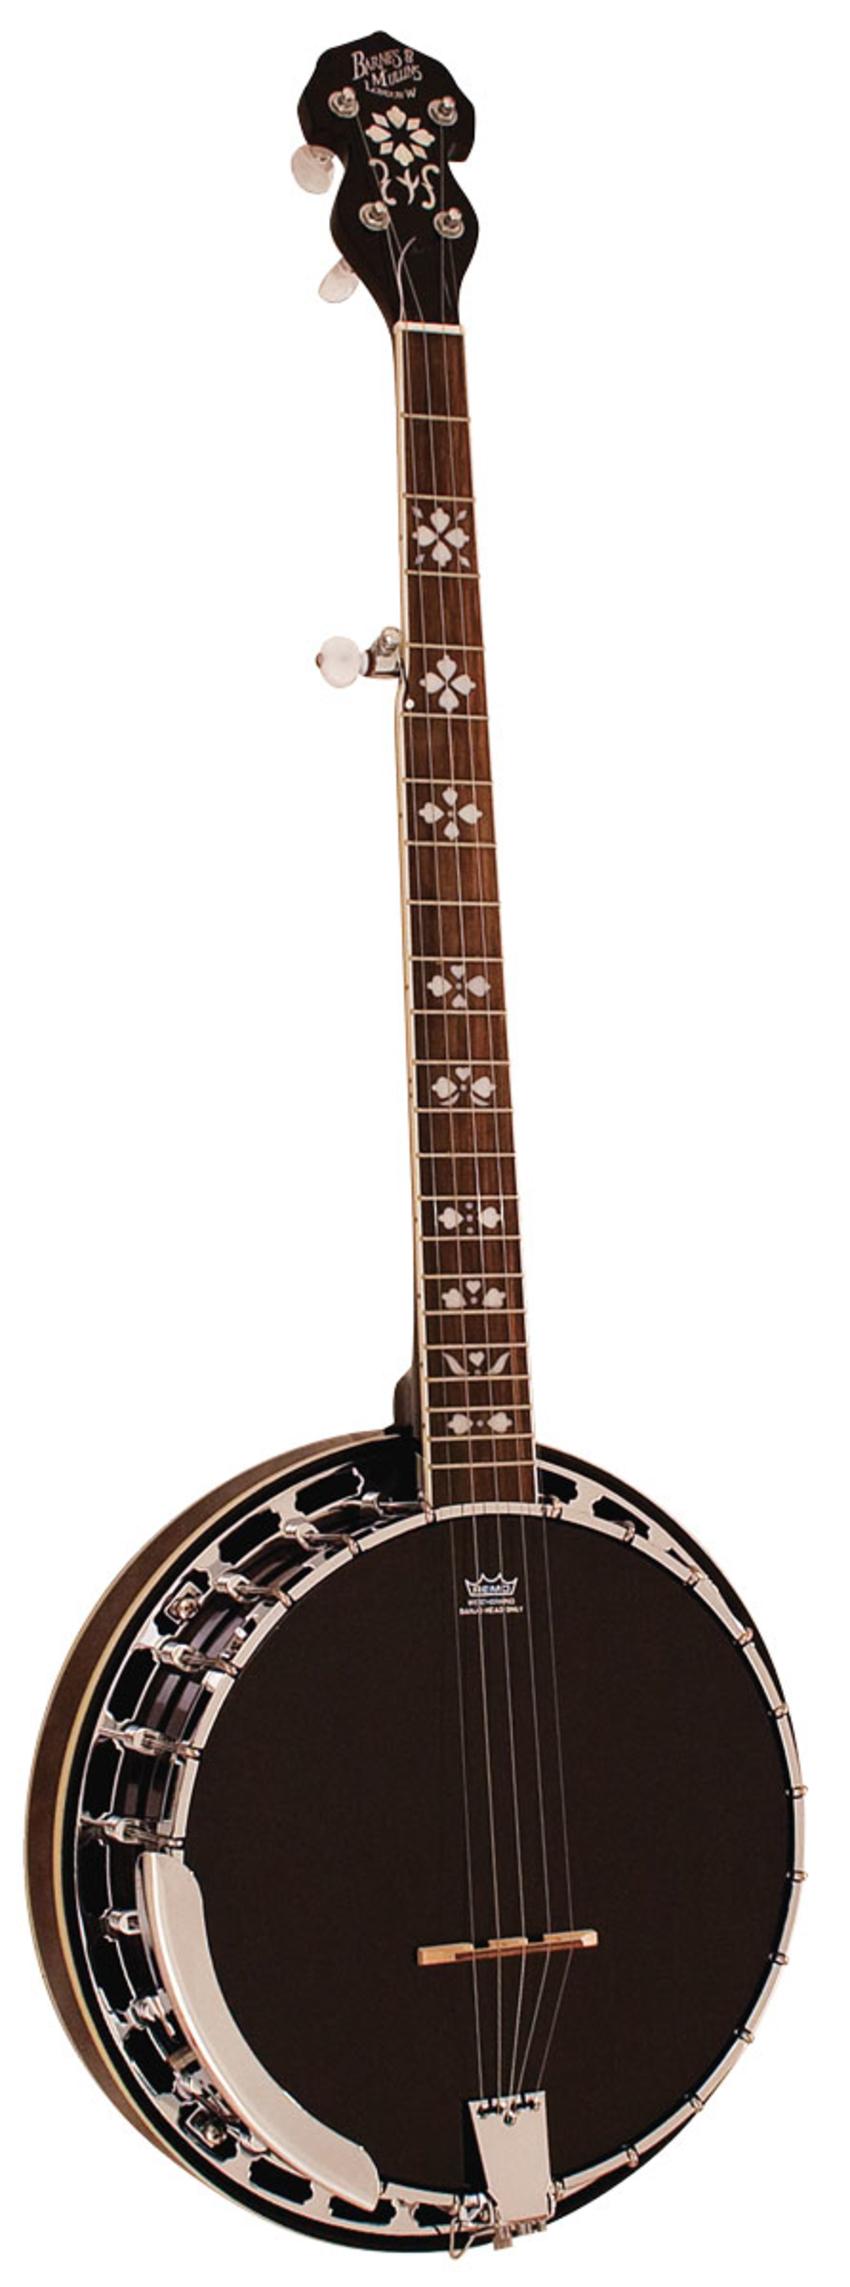 Barnes & Mullins 5 String Electro Banjo. Rathbone Model